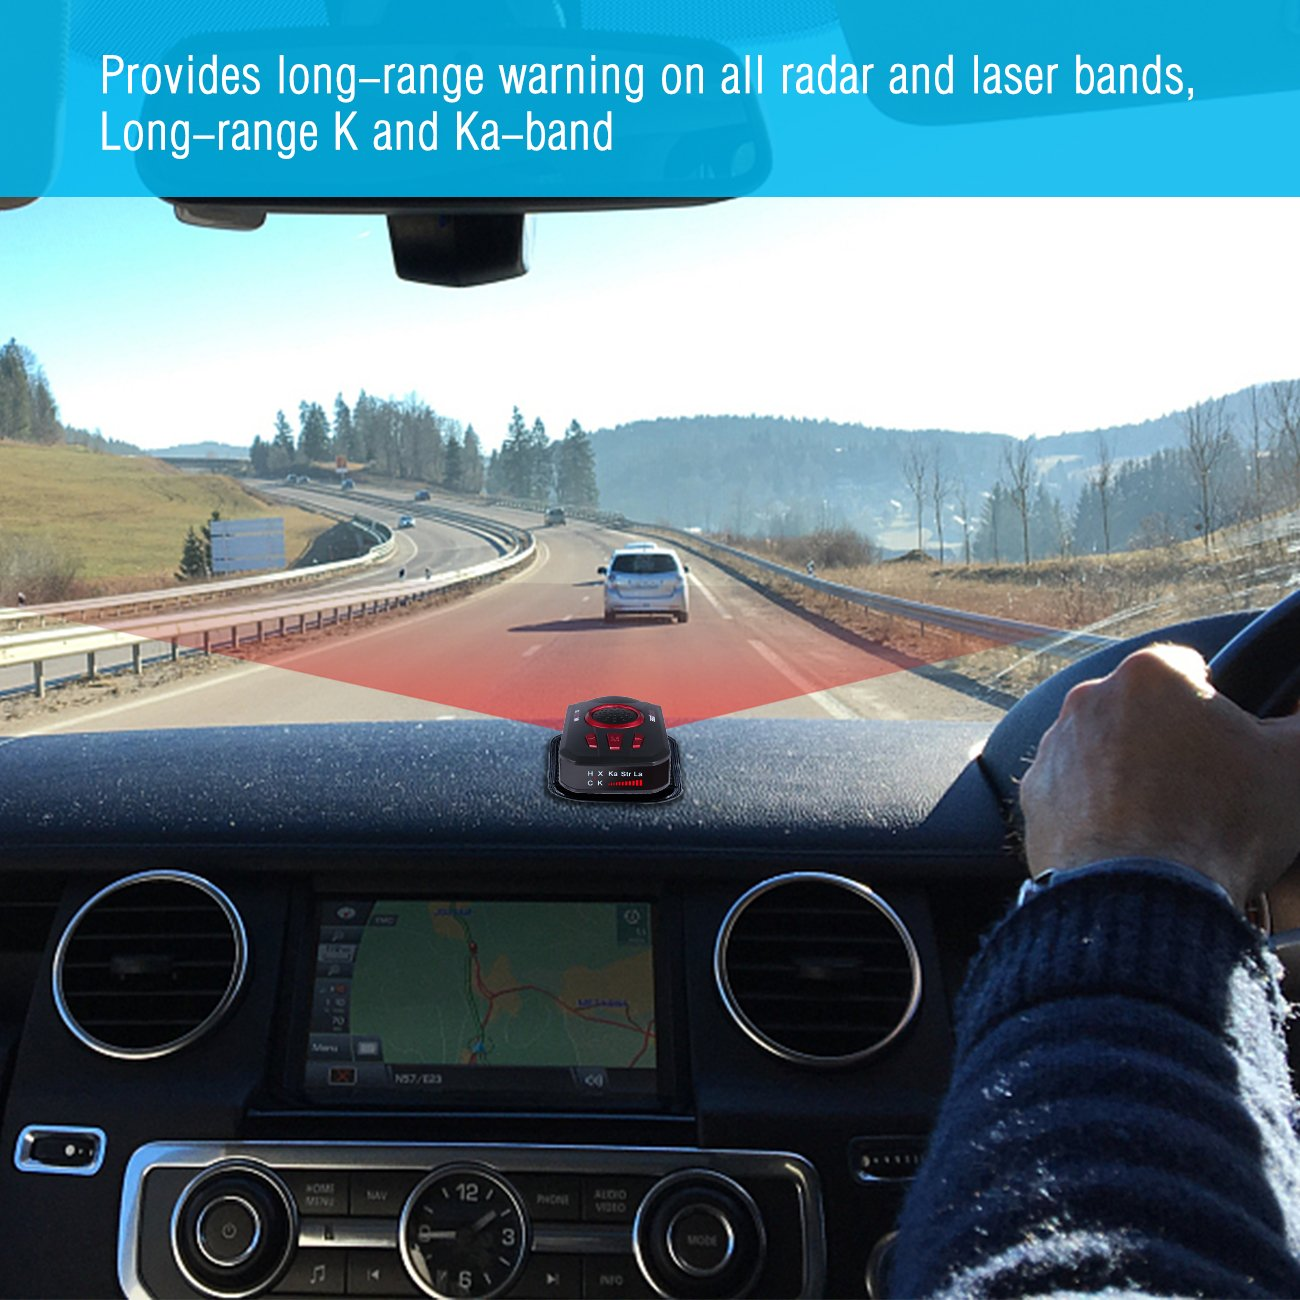 Radar Detector M8 Extreme Long Range Laser Digital Speedometer With Led Display Gps 360 Degree Dsp Voice Alert Car Electronics